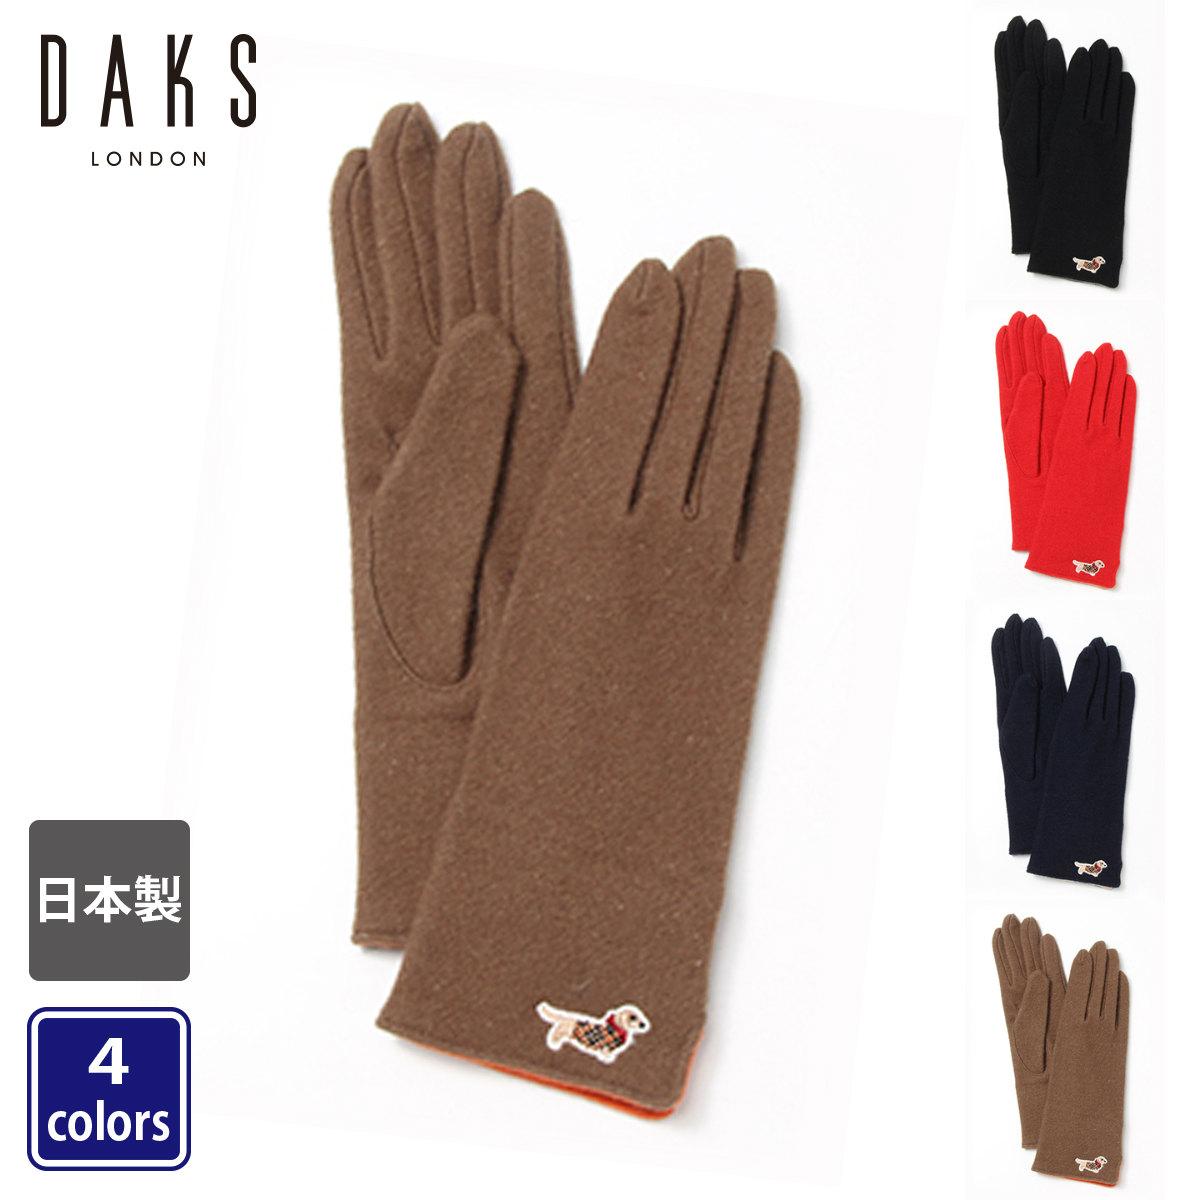 DAKS ダックスフンド刺繍 ウール混 ジャージ レディース手袋 日本製 Mサイズ 全4色